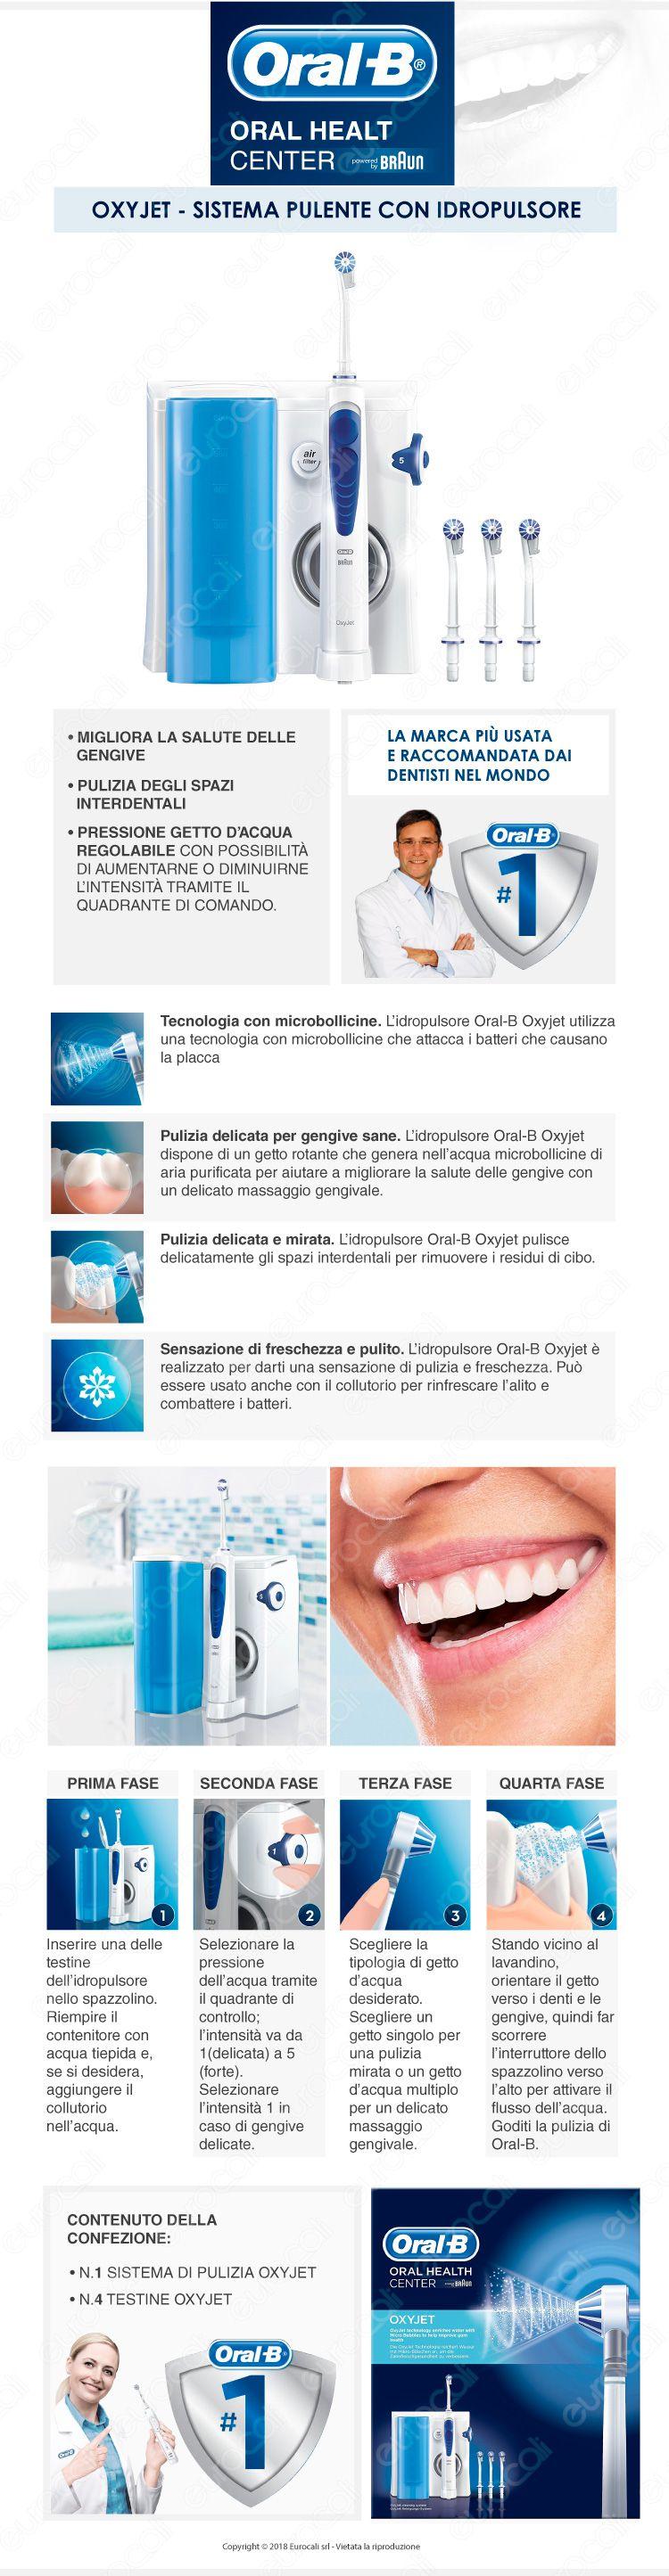 Oral-B idropulsore oxyjet braun igiene orale